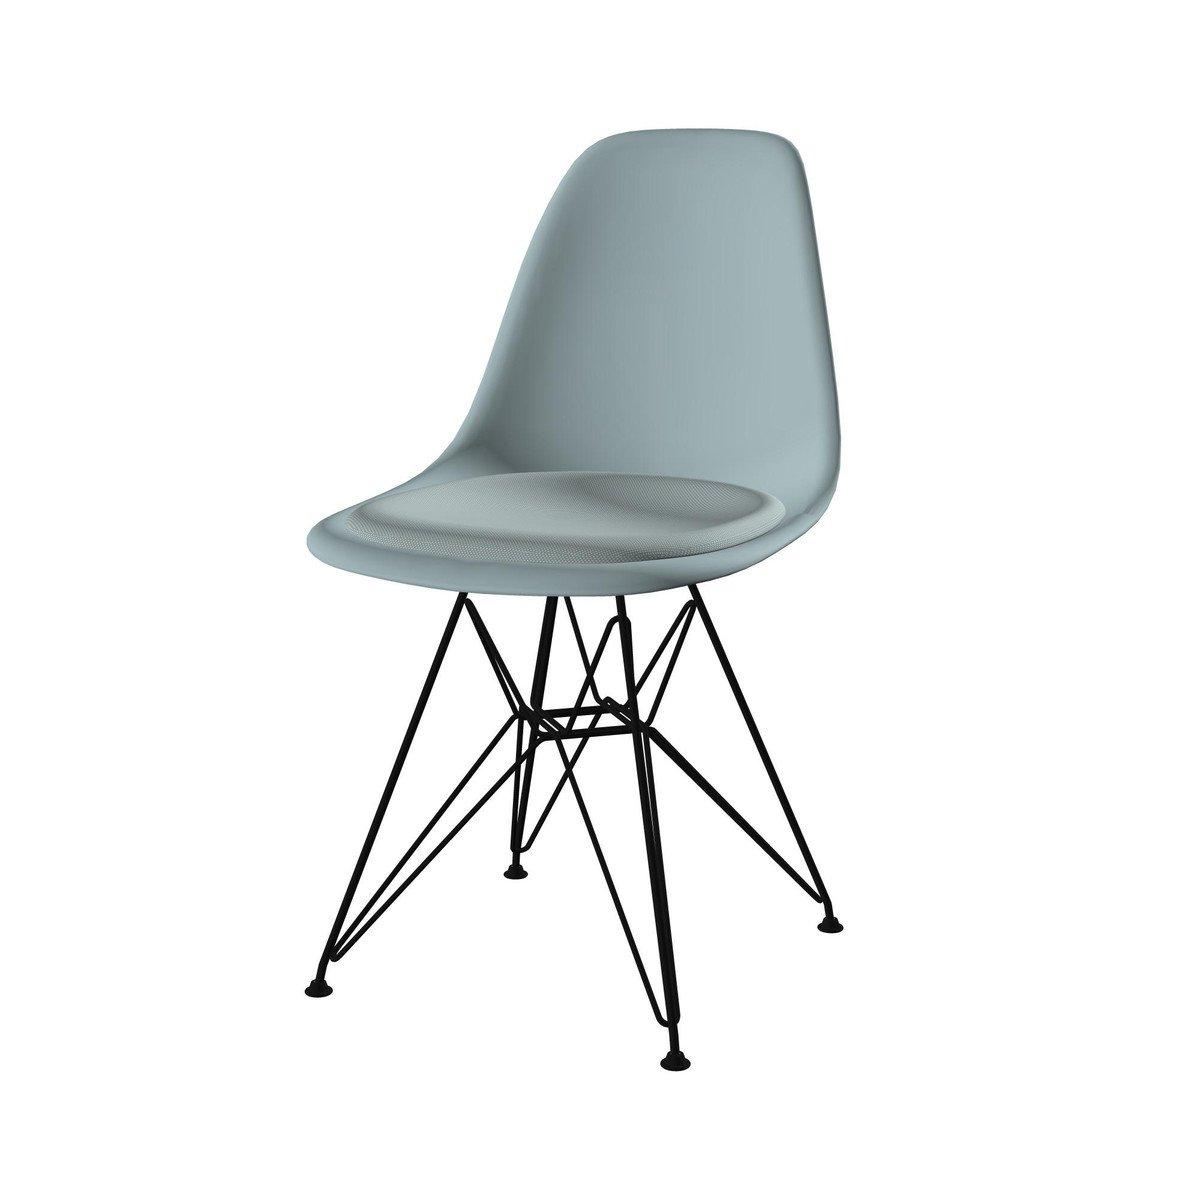 Eames Plastic Side Chair eames plastic side chair dsr upholsterd vitra ambientedirect com